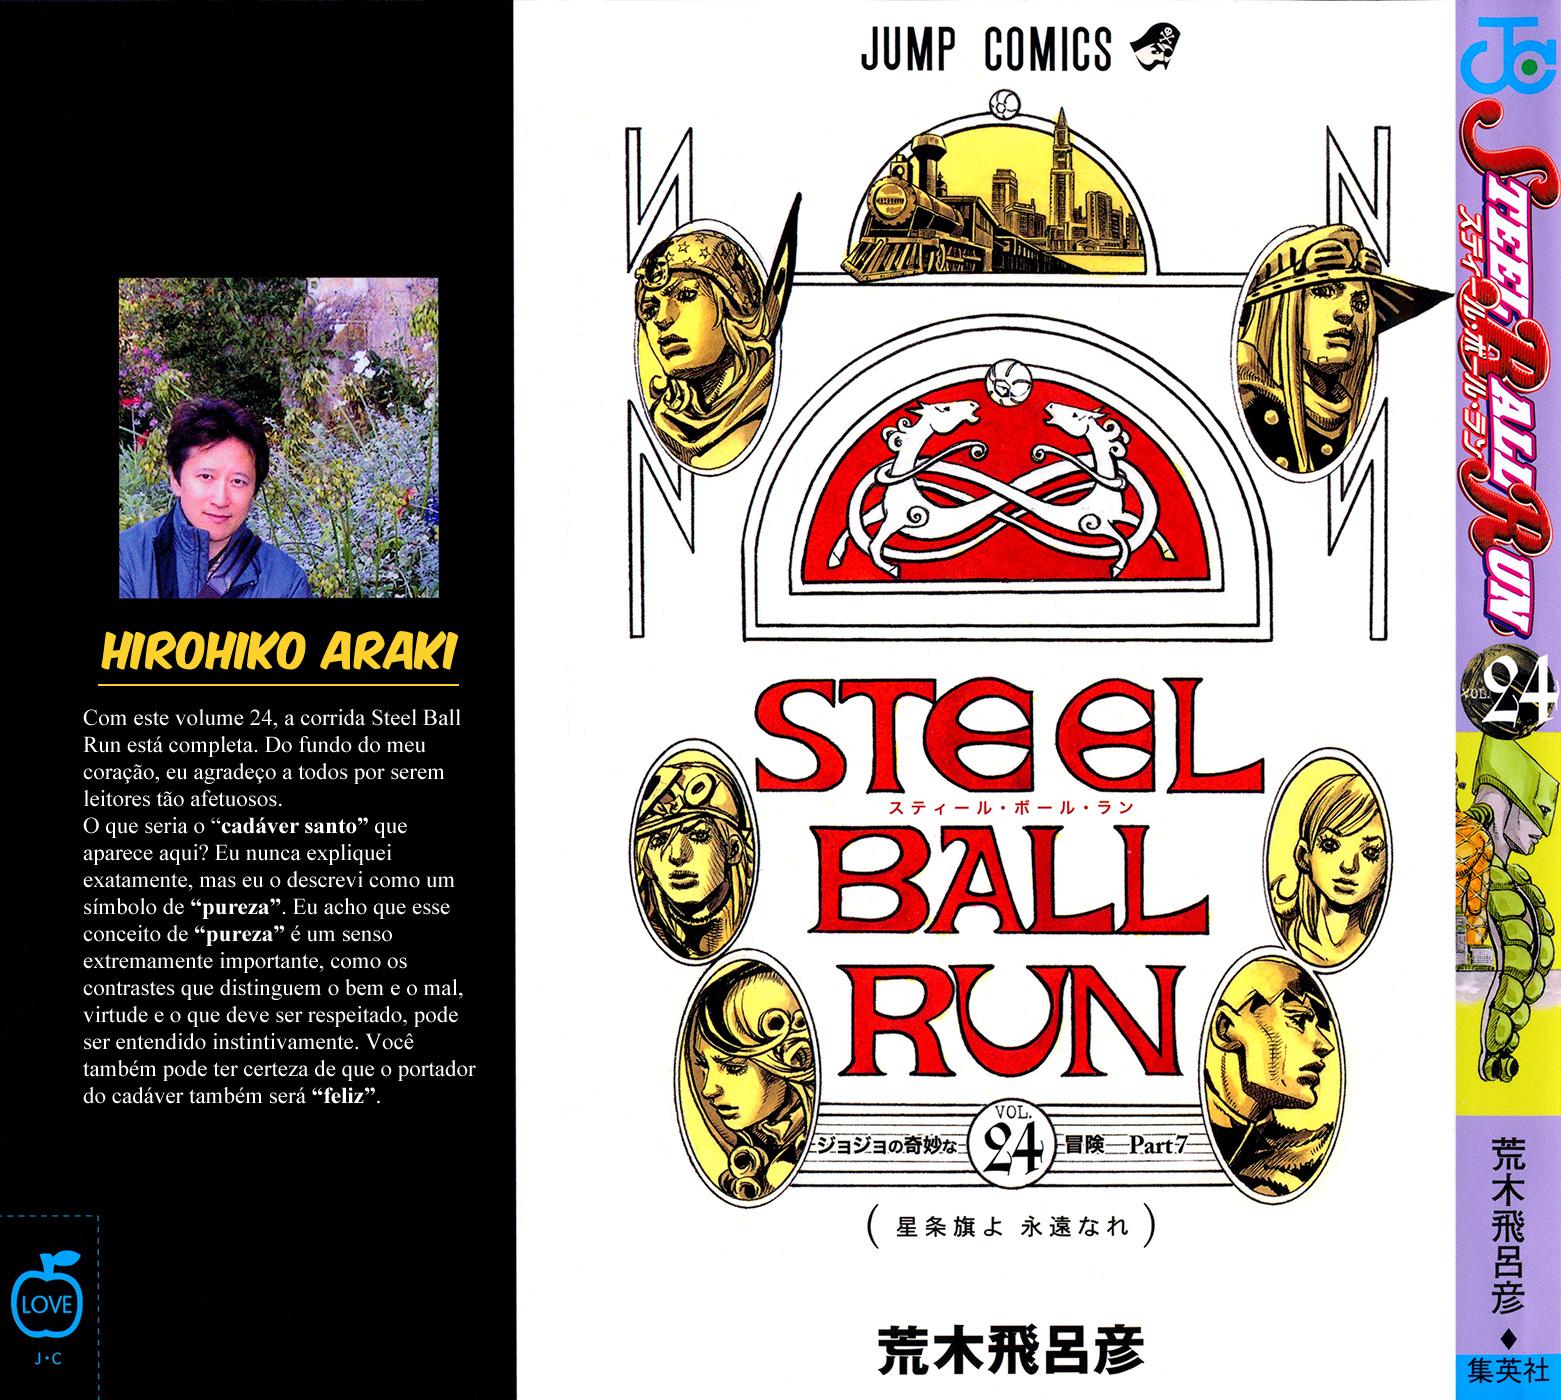 https://nine.mangadogs.com/br_manga/pic/14/5582/6478269/JoJosBizarreAdventurePart7_0_128.jpg Page 1